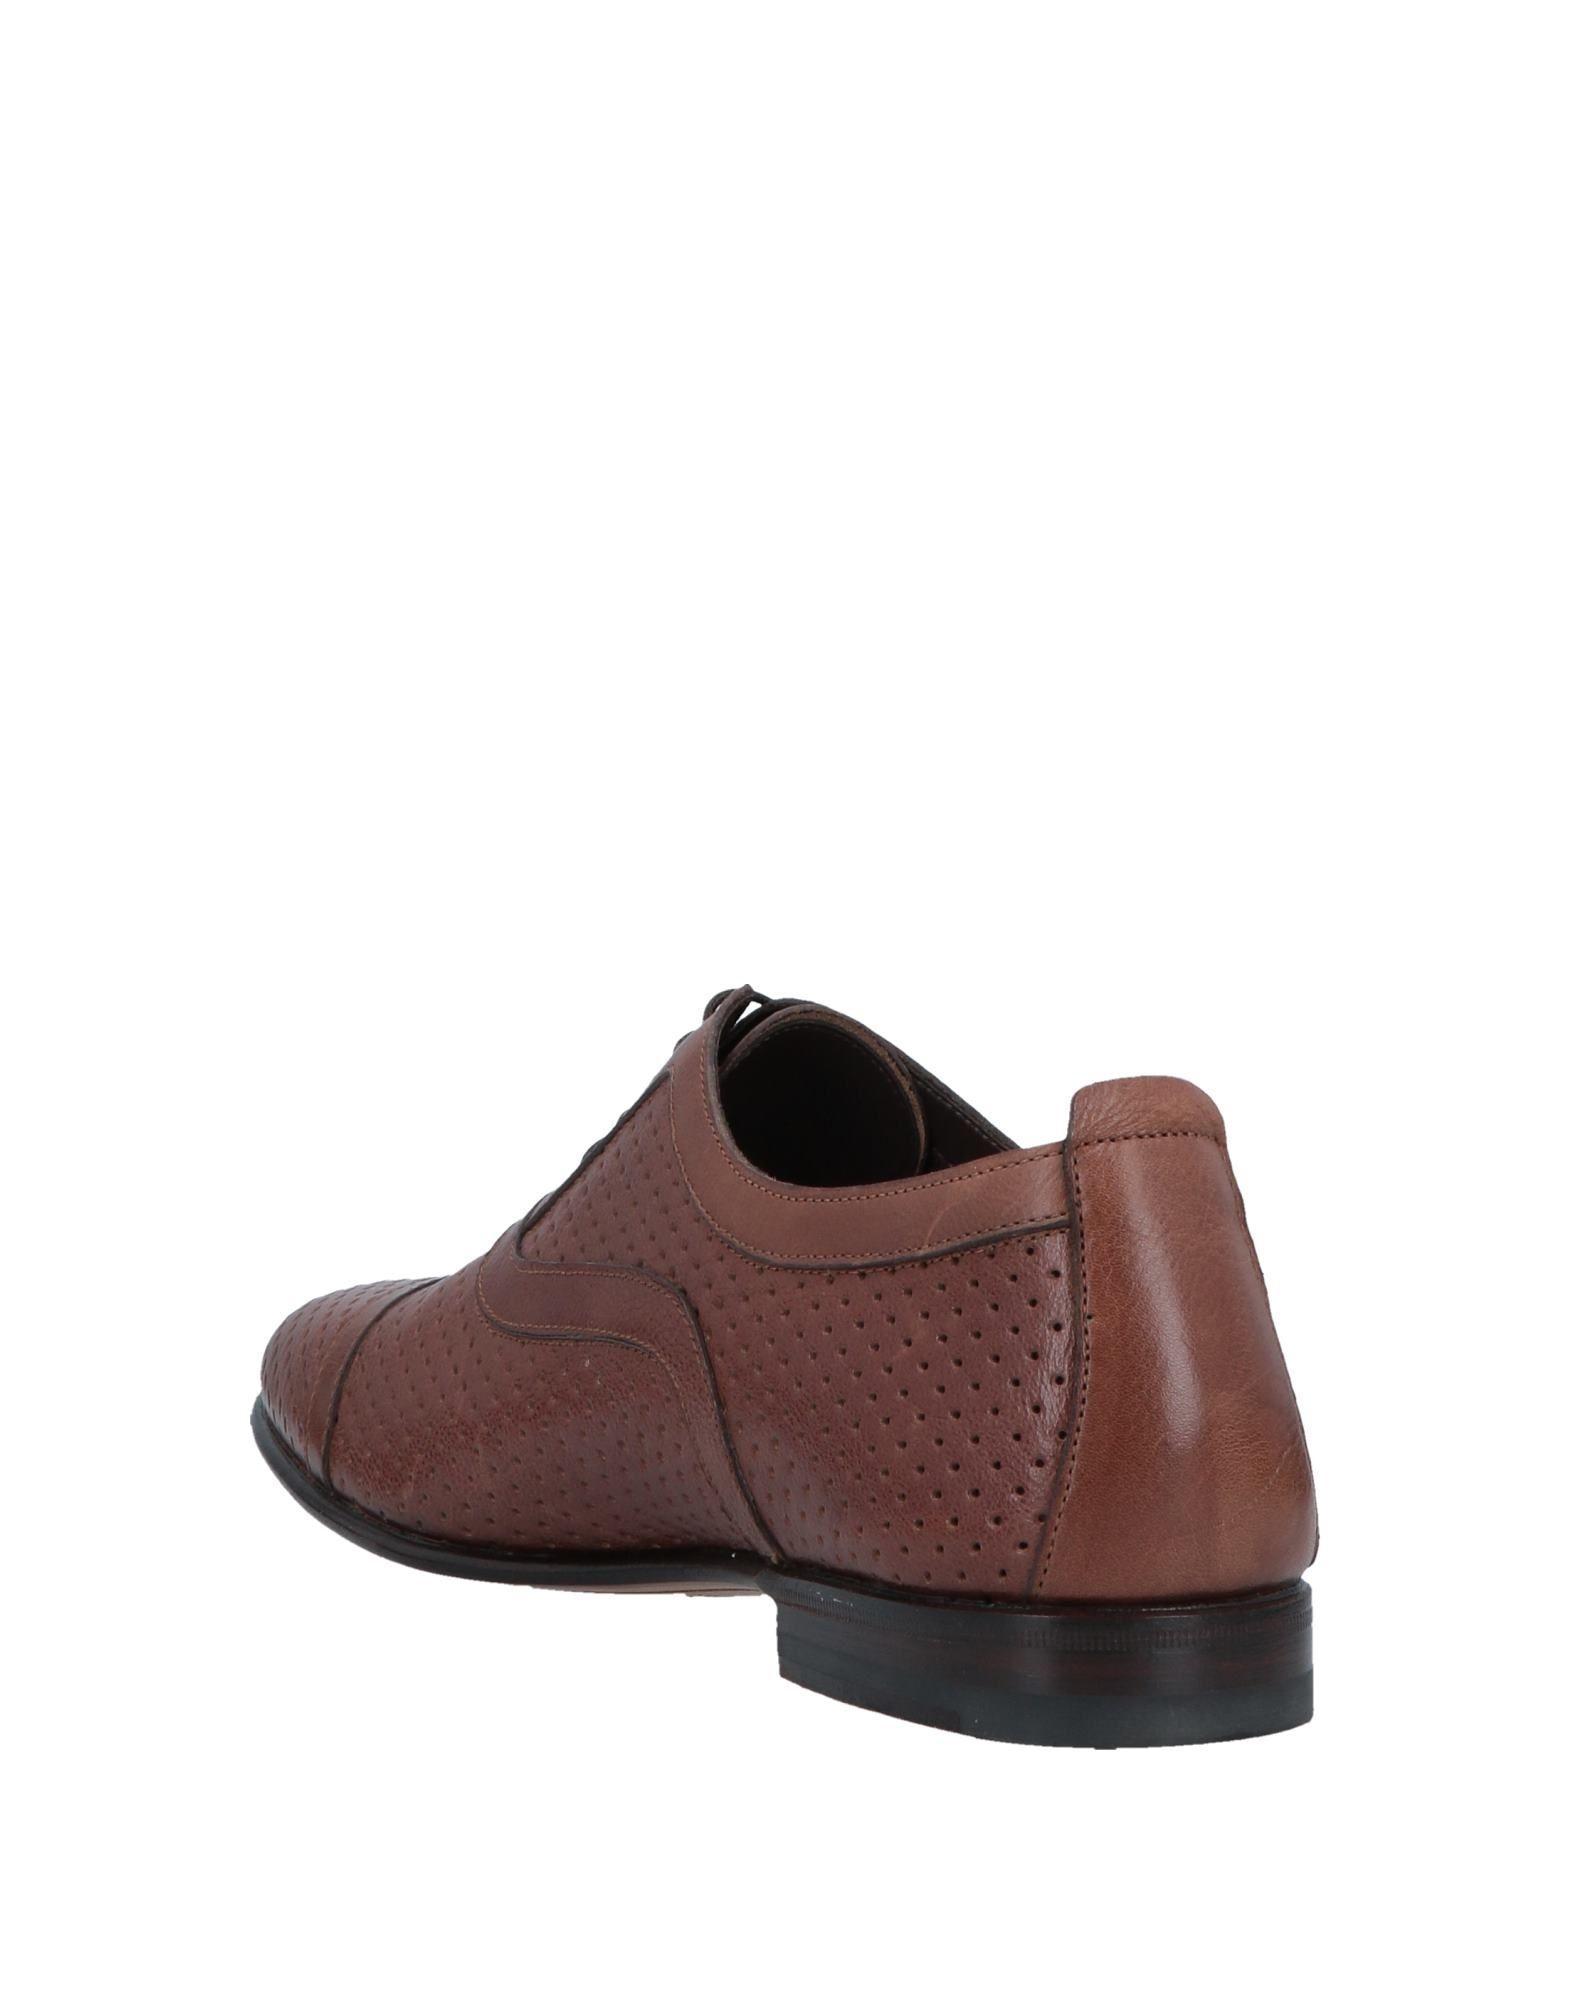 a73d788038f8c0 Lyst - Santoni Lace-up Shoe in Brown for Men